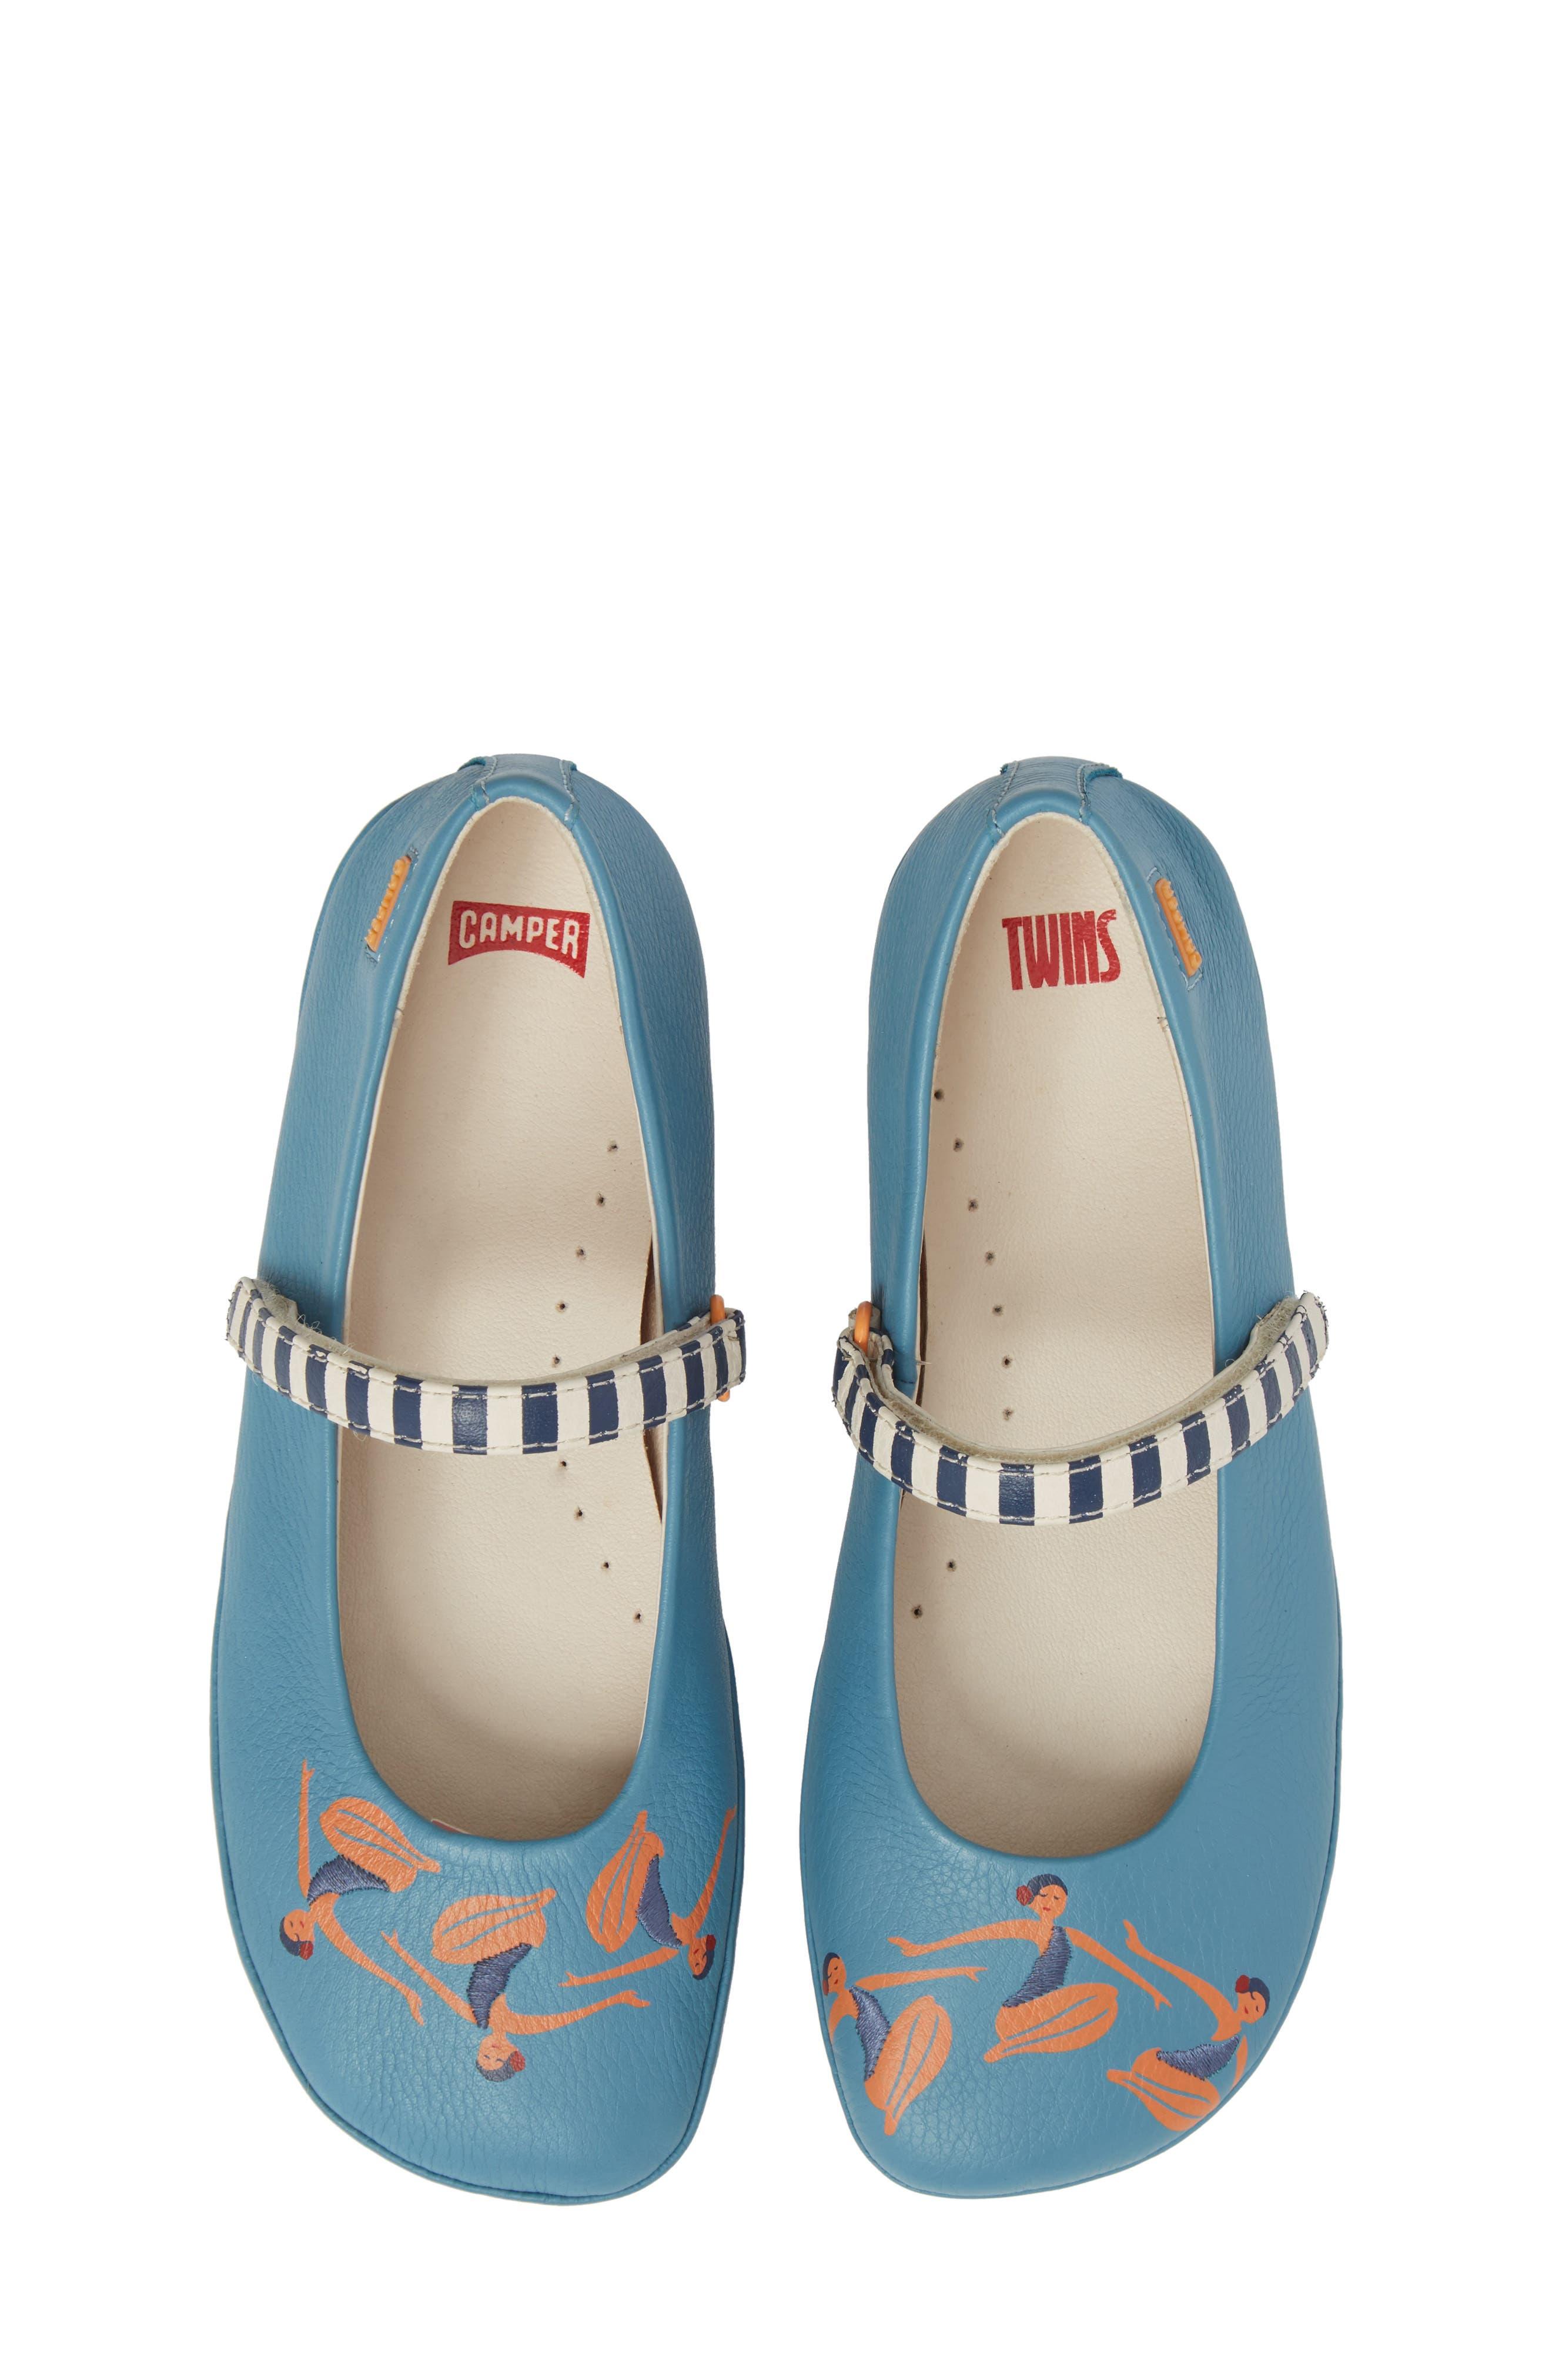 Twins Mary Jane Flat,                             Main thumbnail 1, color,                             420